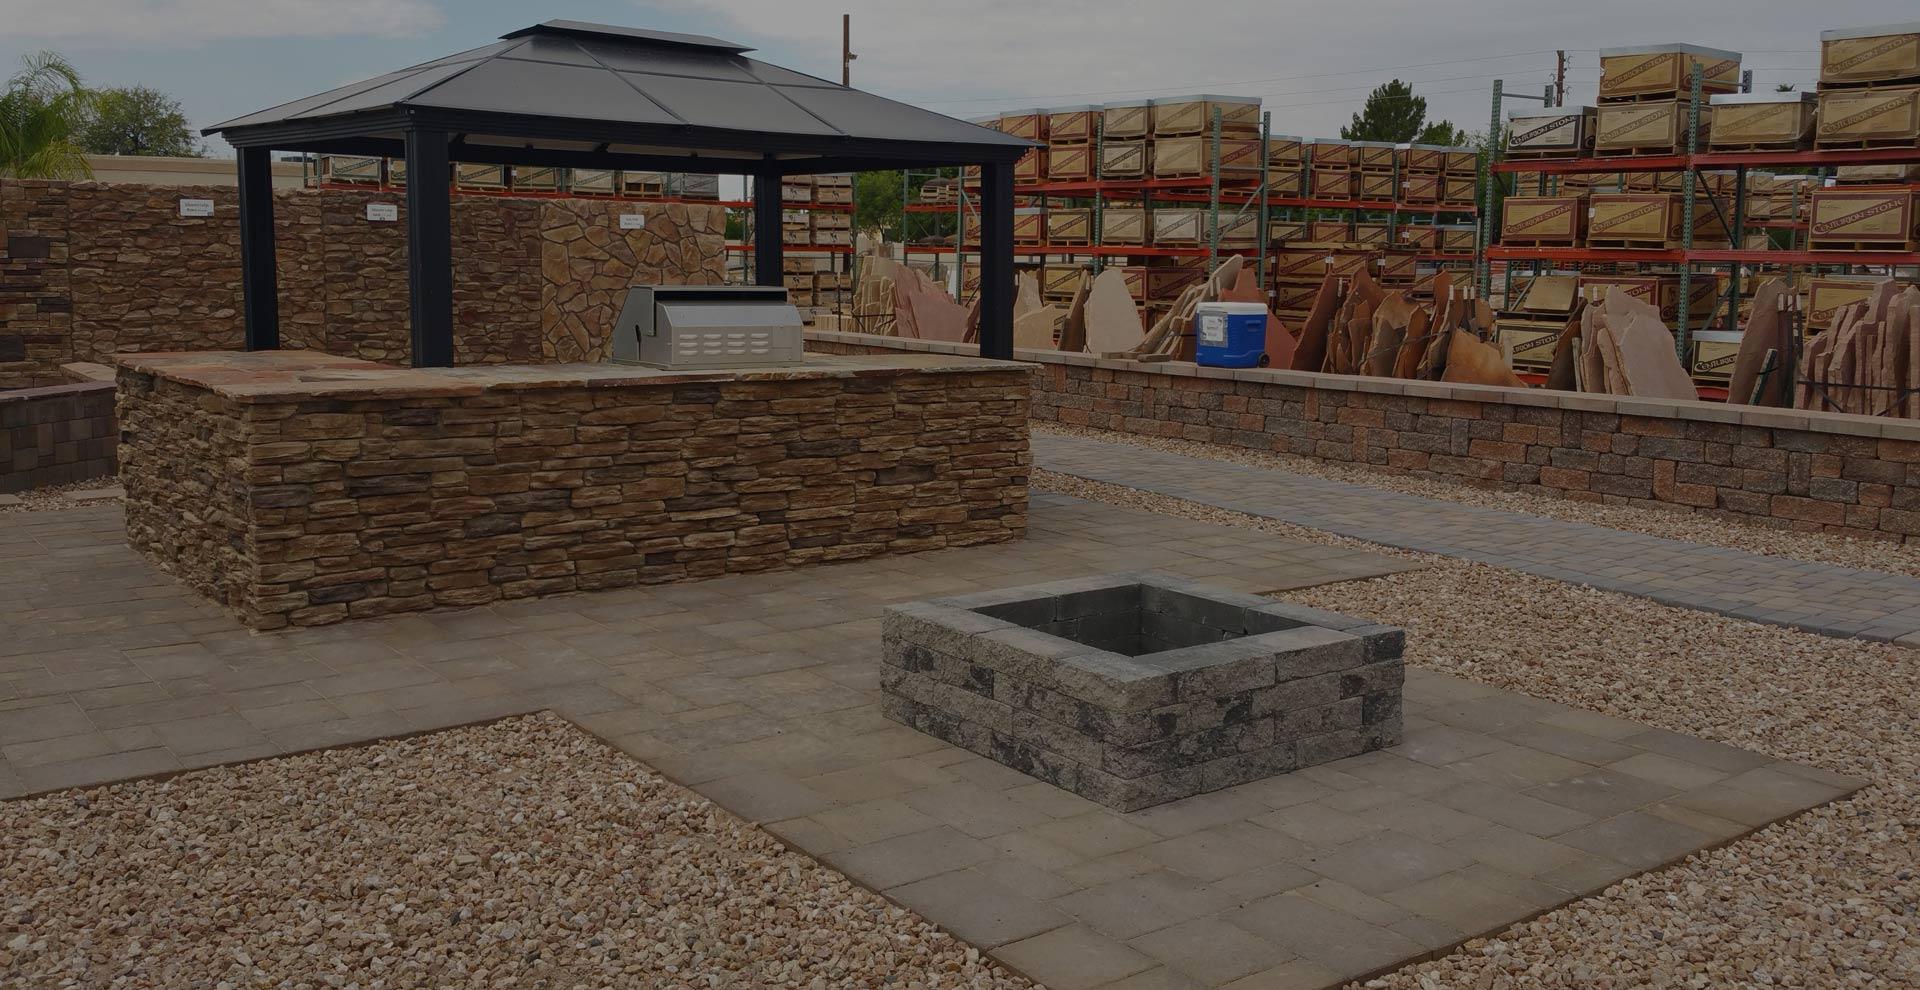 1 Stone Supplier  Veneer Paver Tile  More  Centurion Stone of Arizona